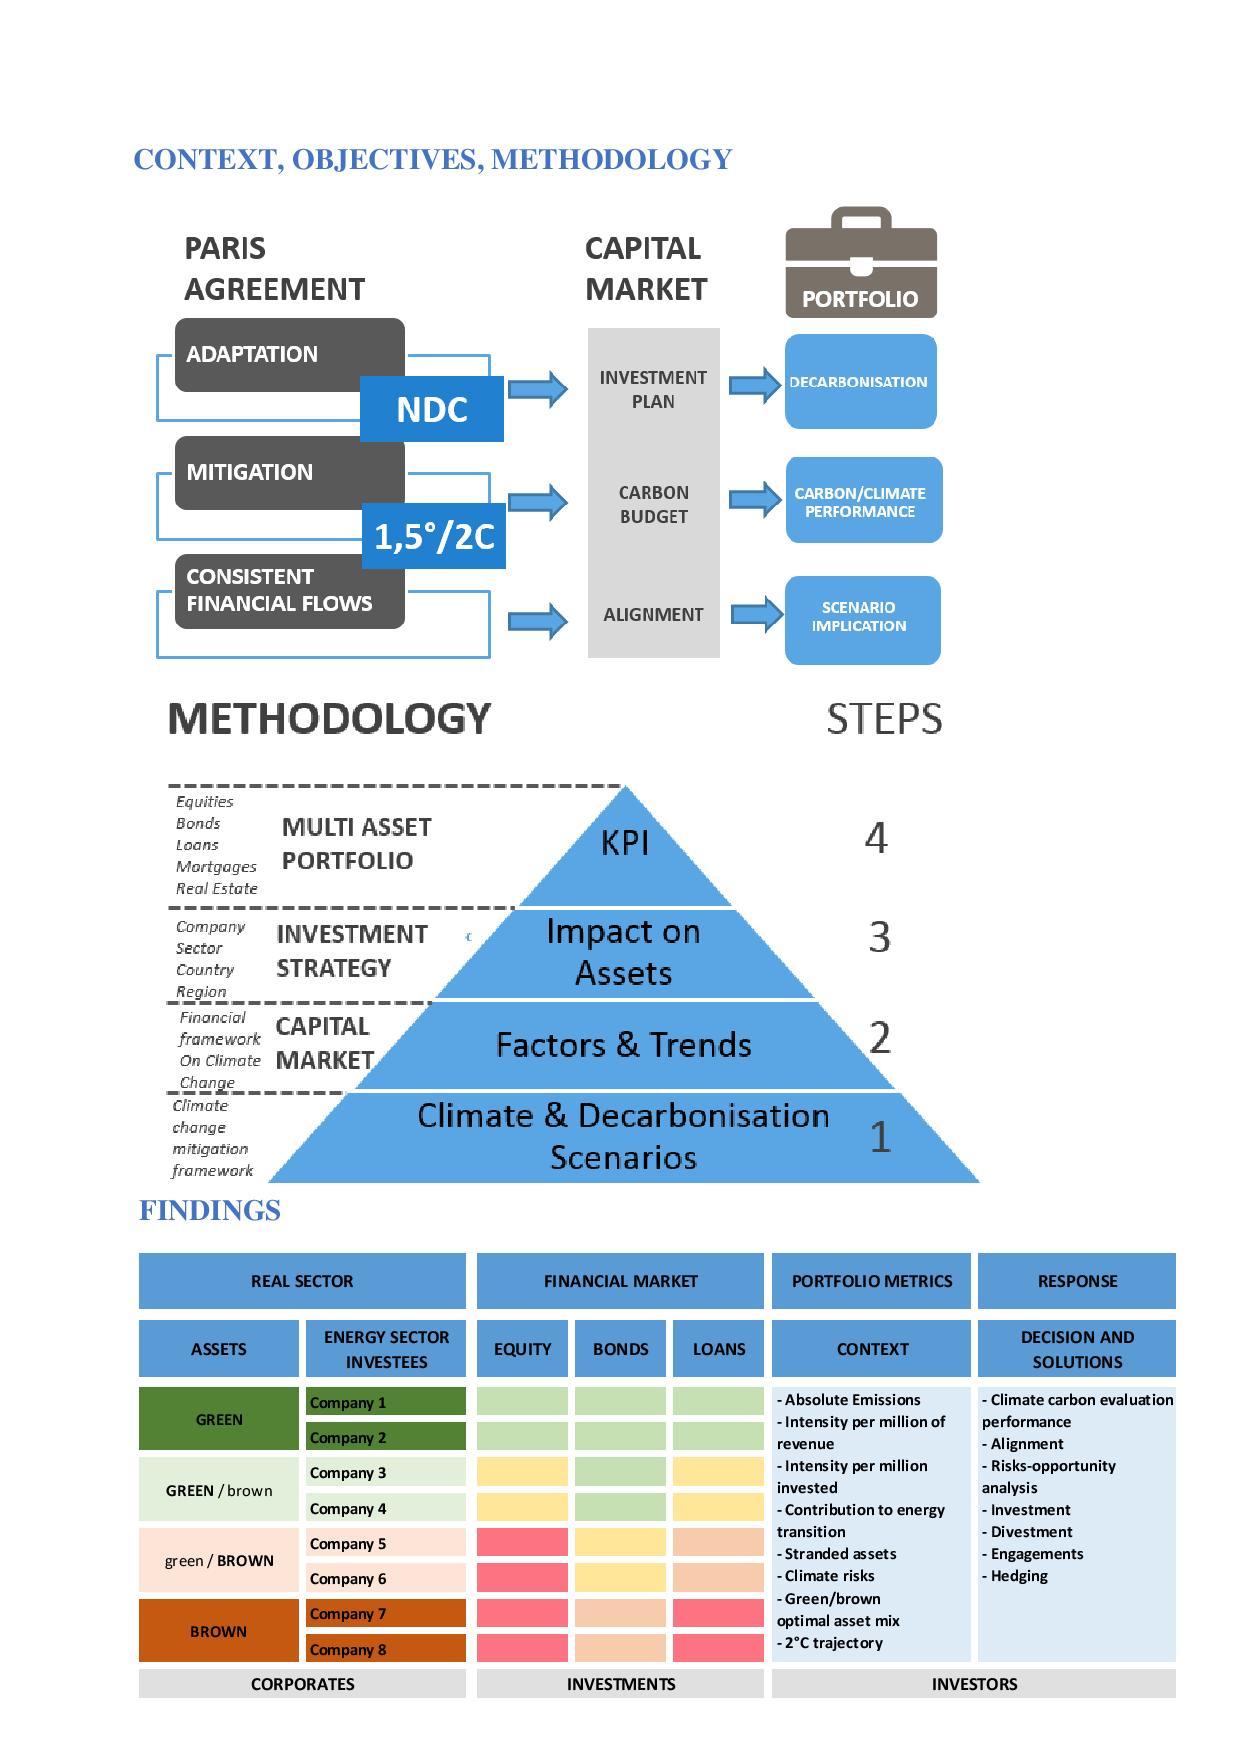 5c5d713172961-Communication+proposal+image.jpg